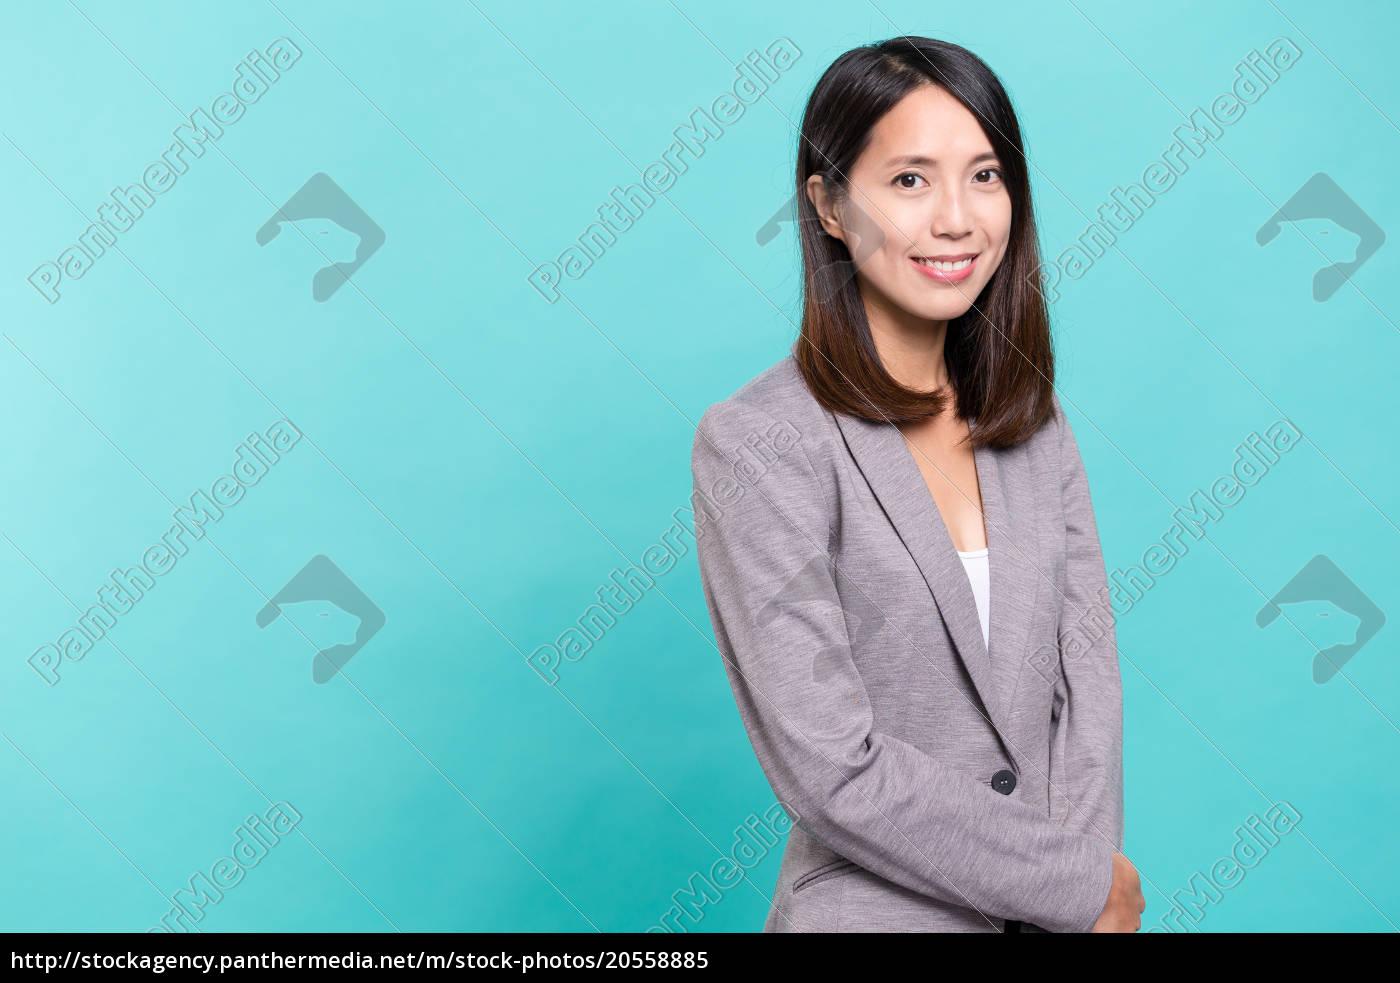 businesswoman, portrait - 20558885